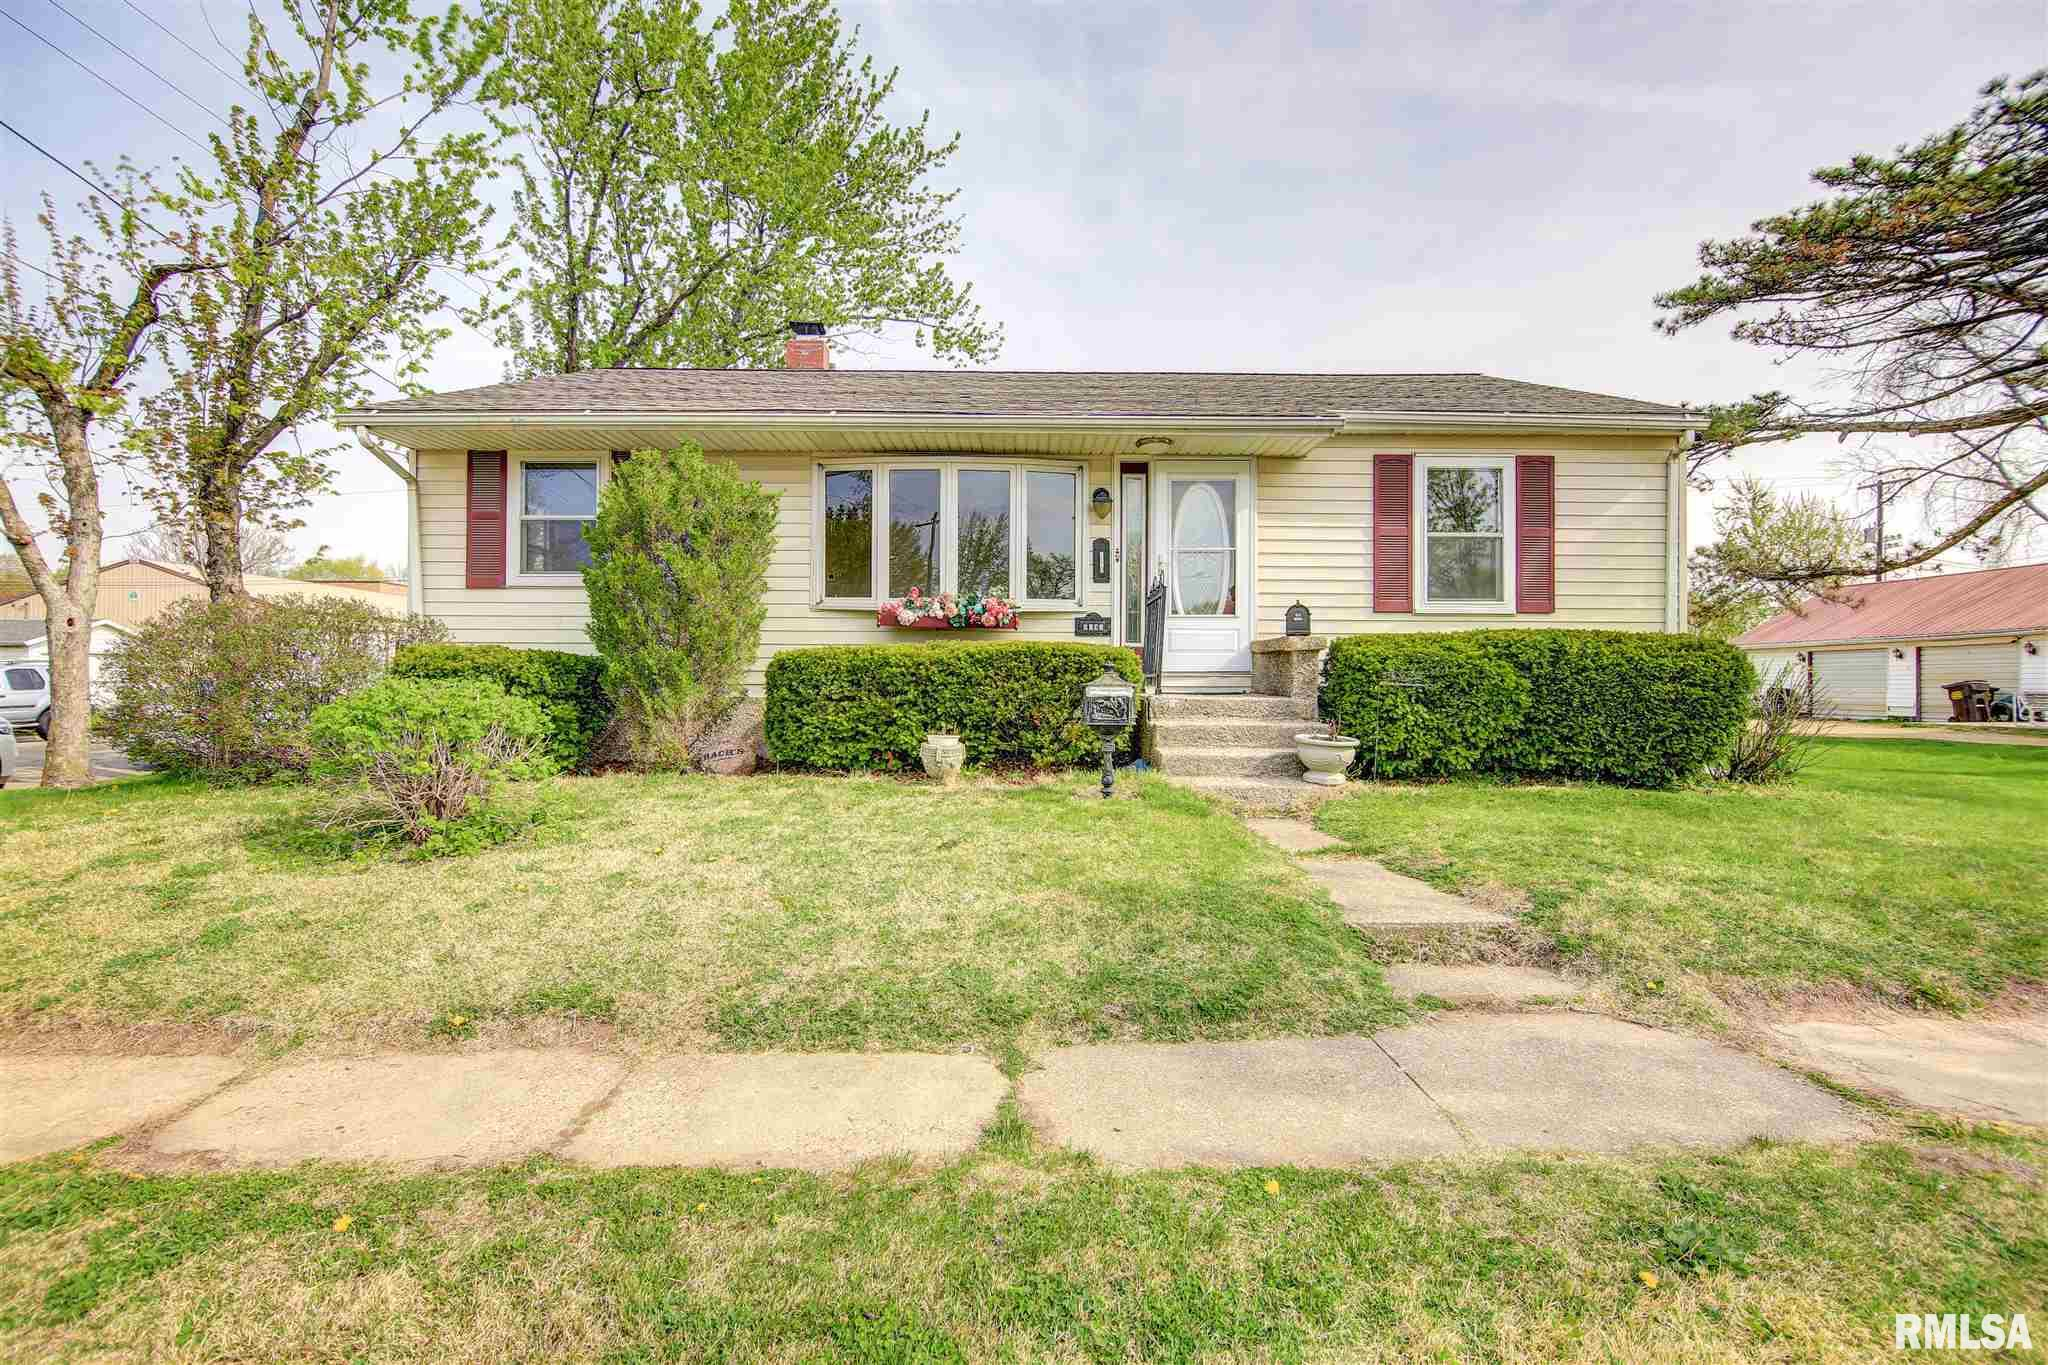 1301 14TH Property Photo - Fulton, IL real estate listing